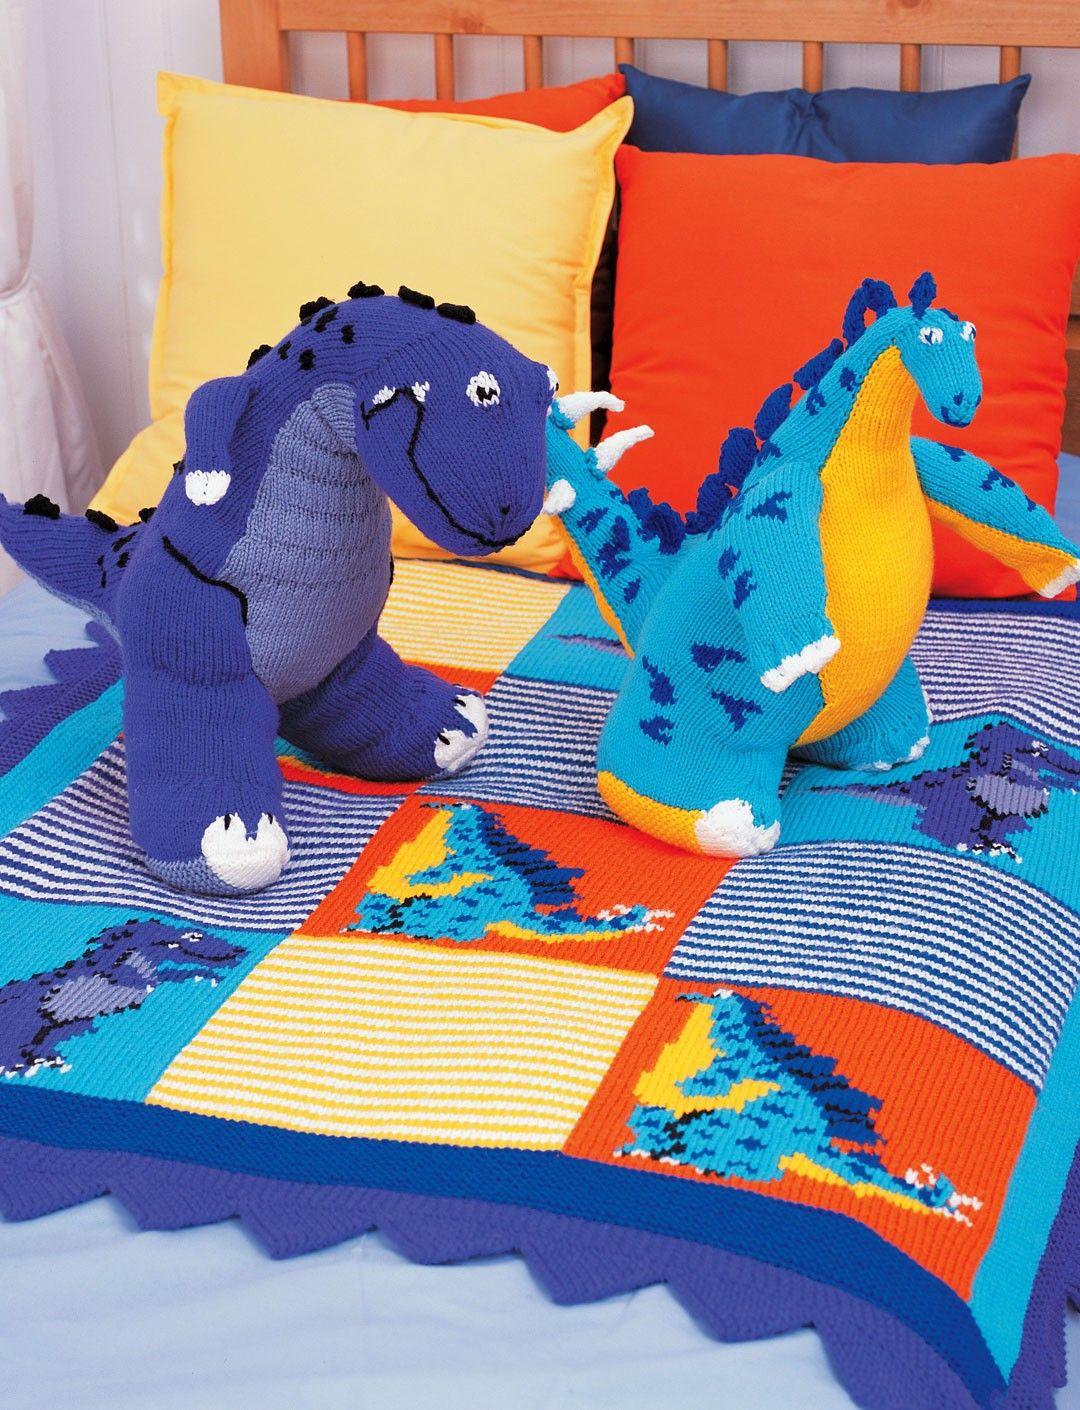 22cdb3104f Yarnspirations.com - Patons Dinosaurs Blanket - Patterns ...